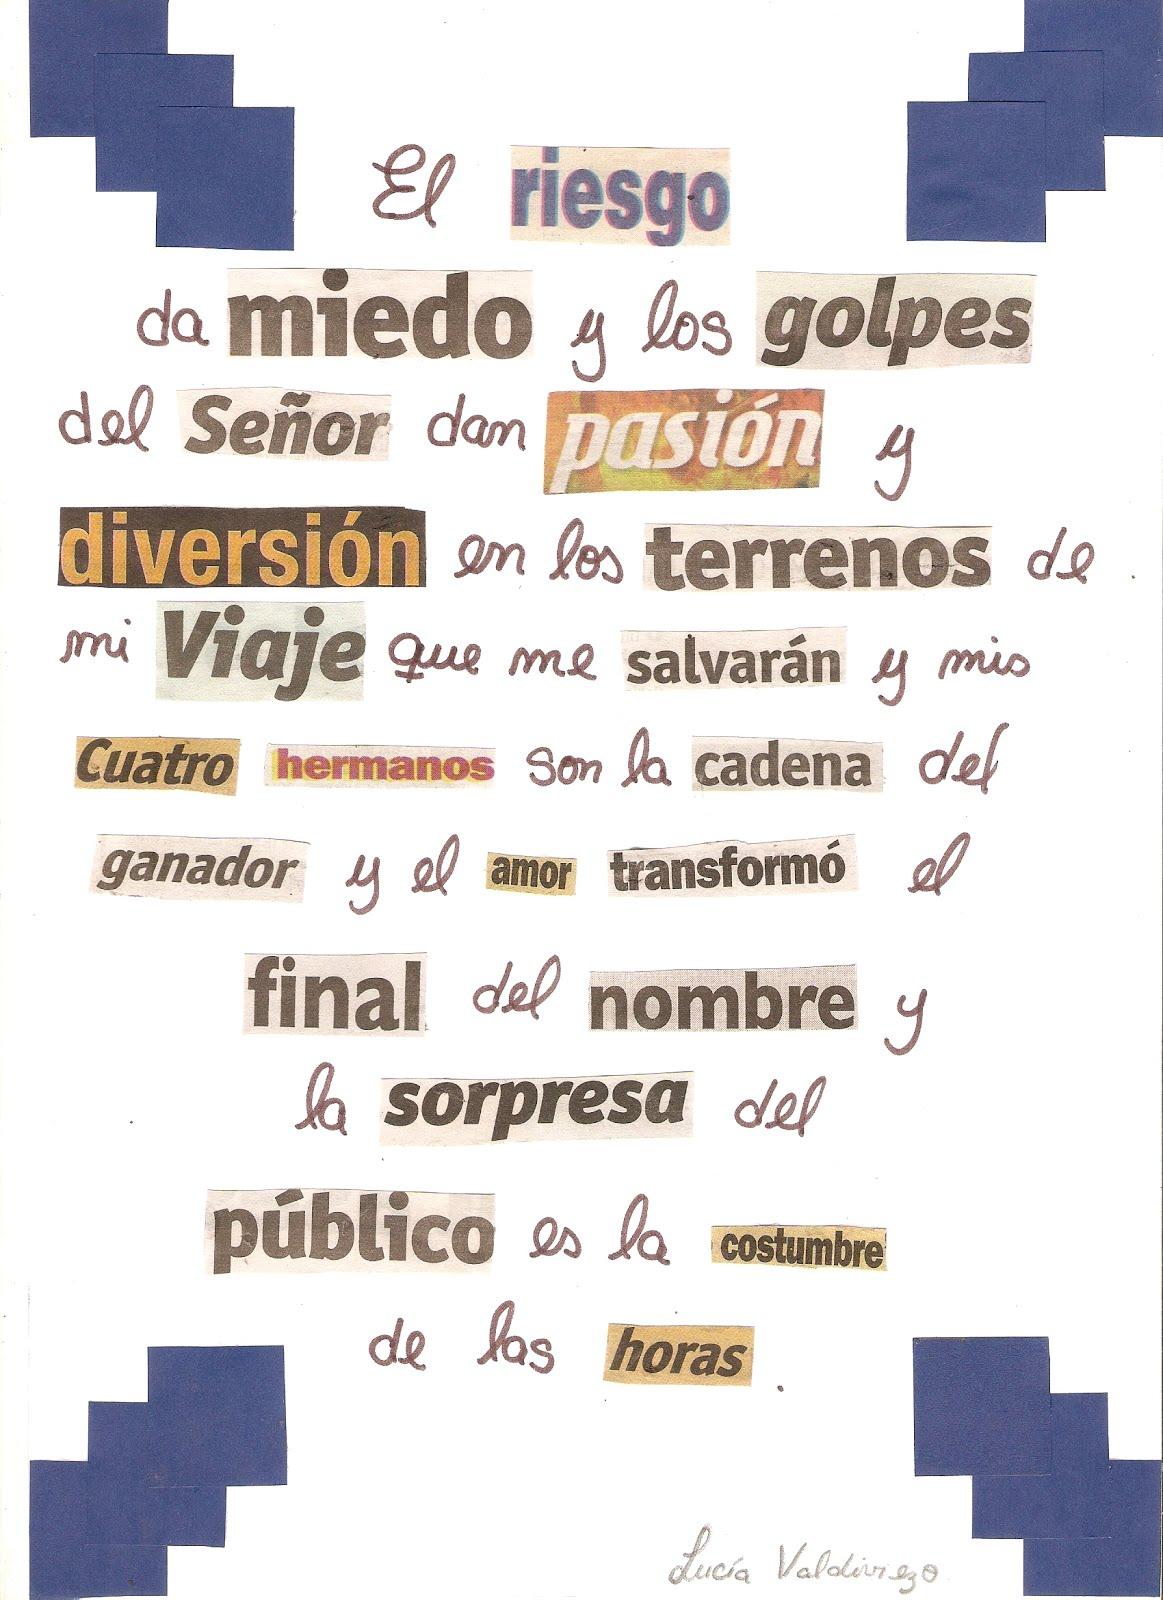 Poema Vanguardista-Dadaismo   Tareas de Comunicacion